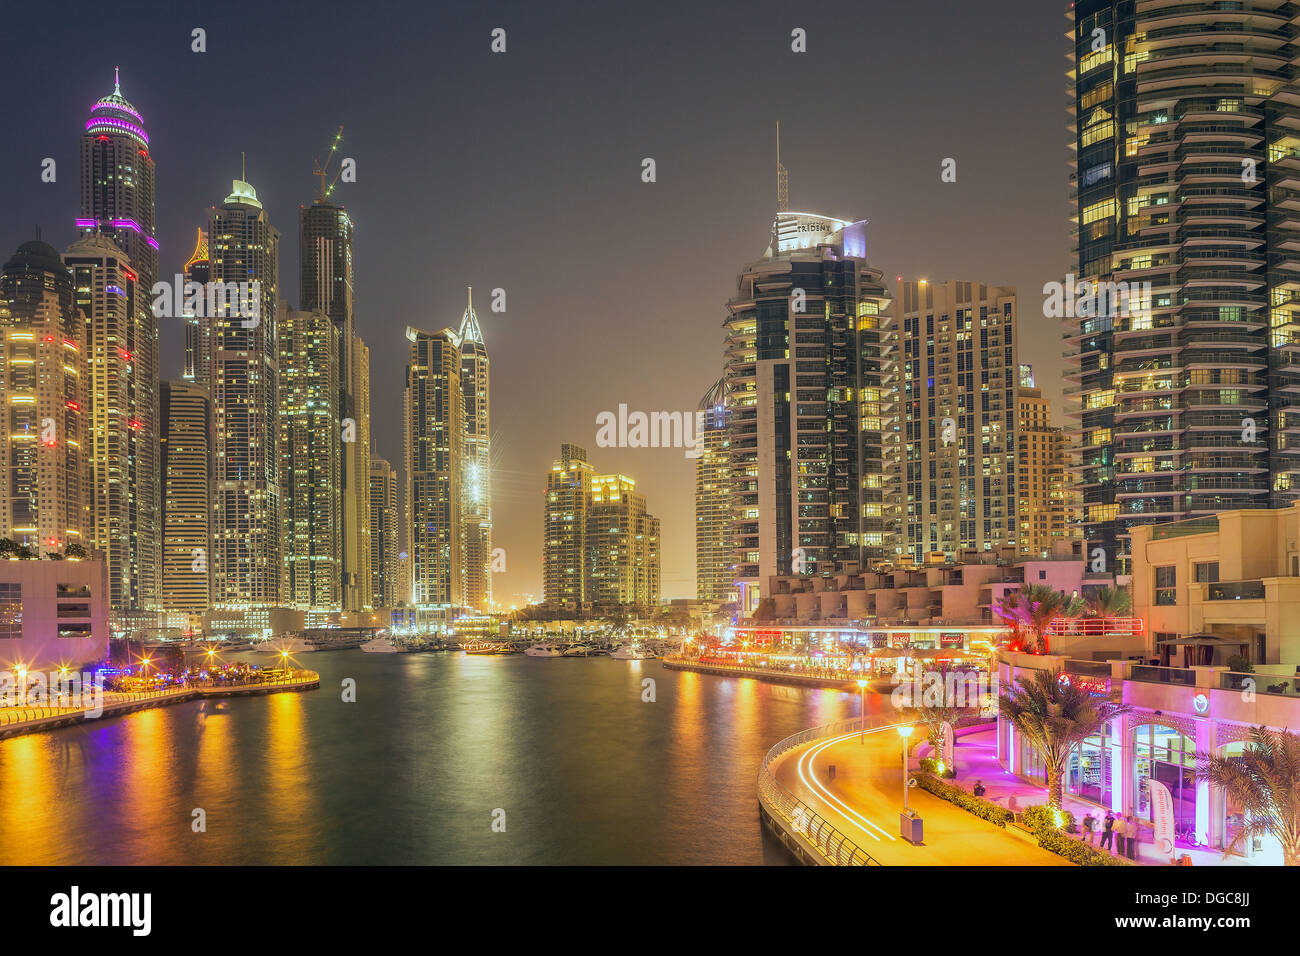 Skyscrapers in Dubai marina, Dubai, United Arab Emirates - Stock Image